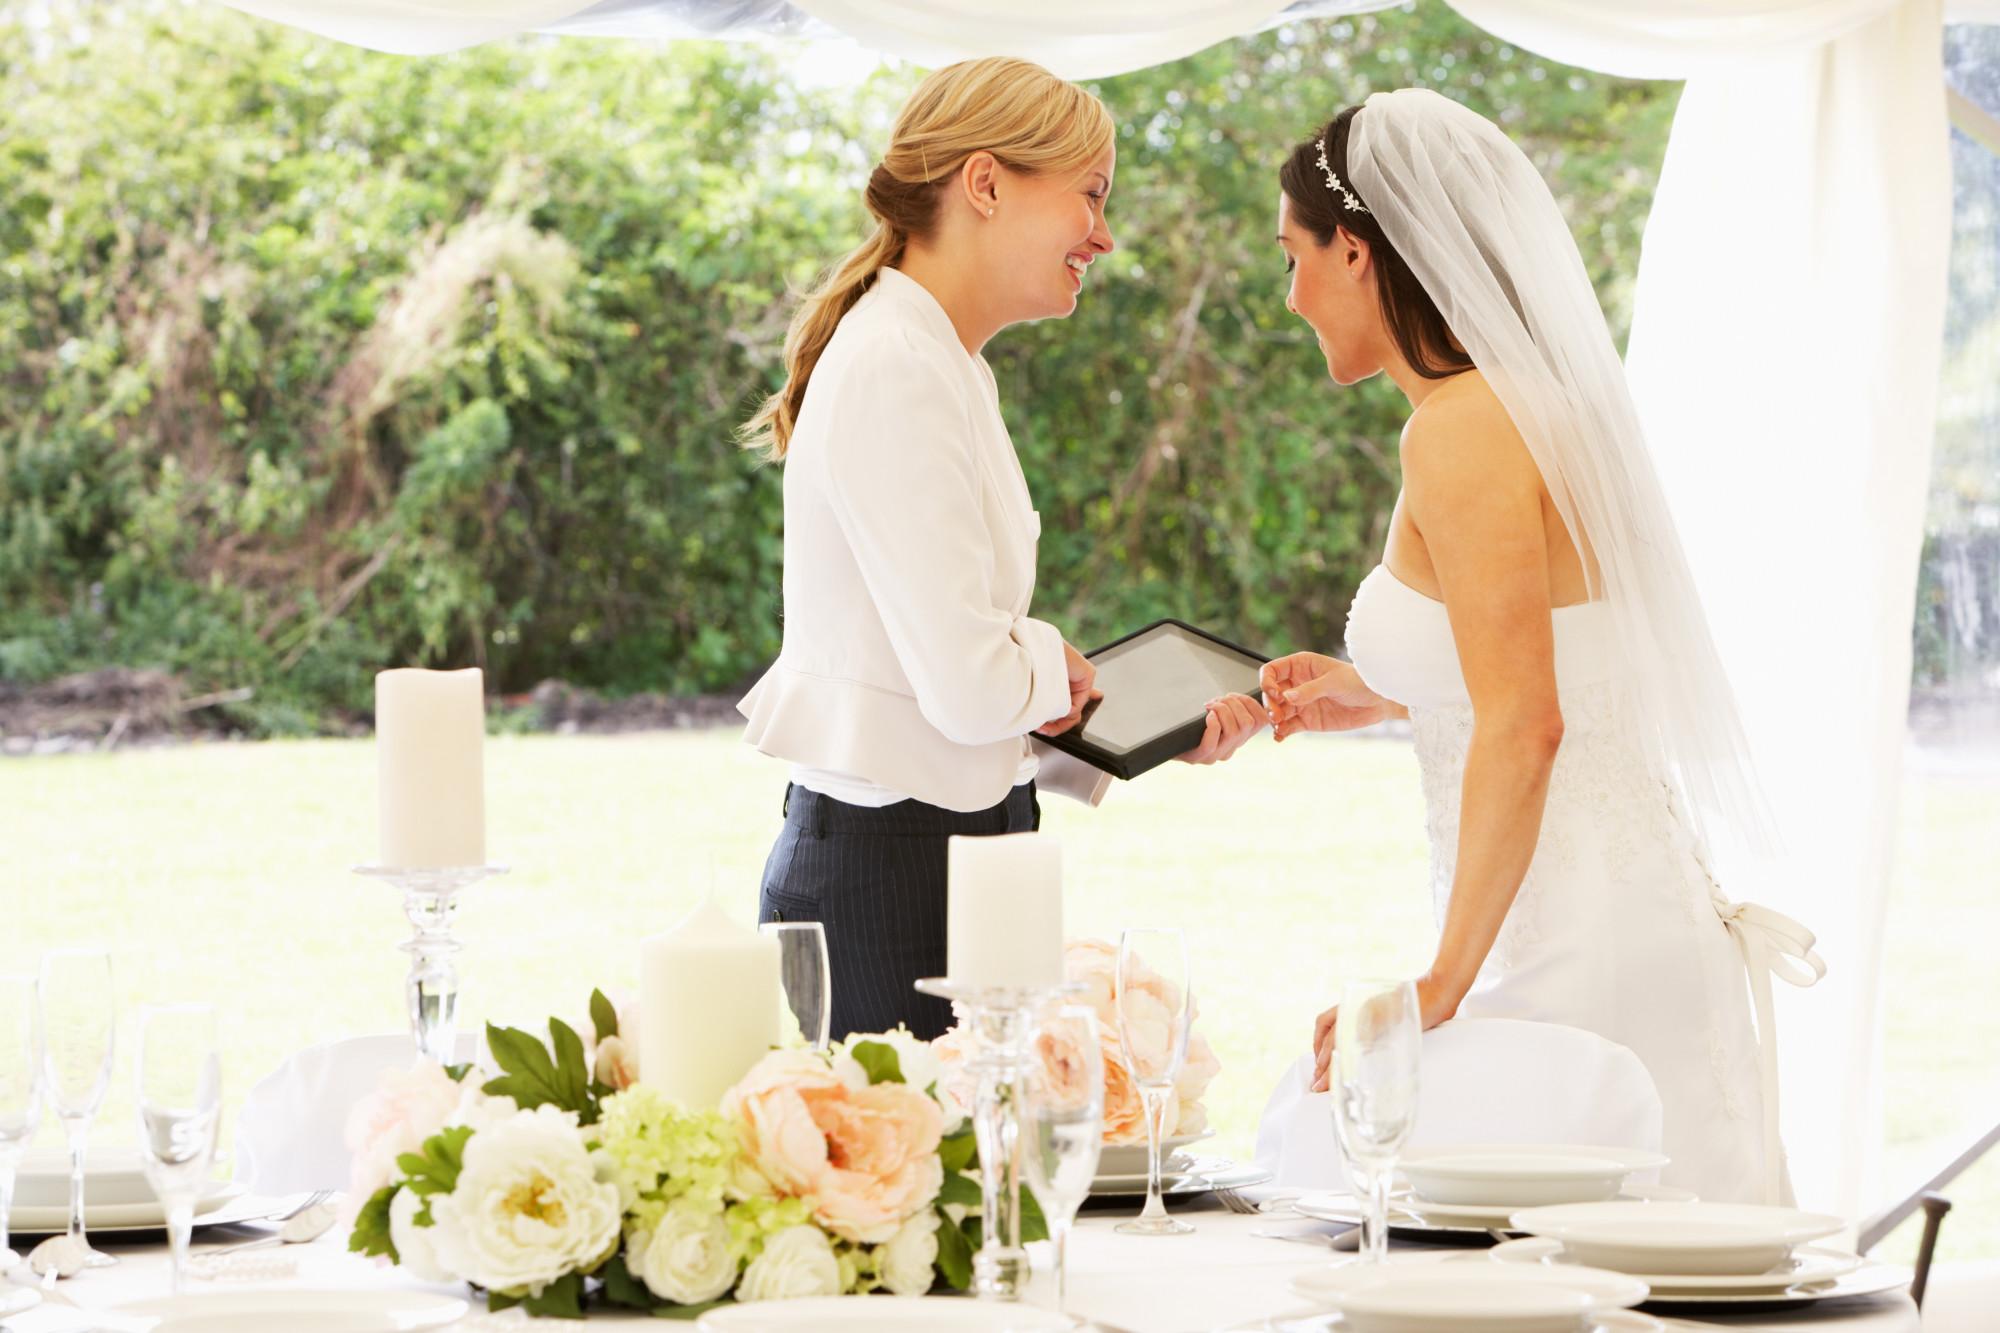 wedding planner cost